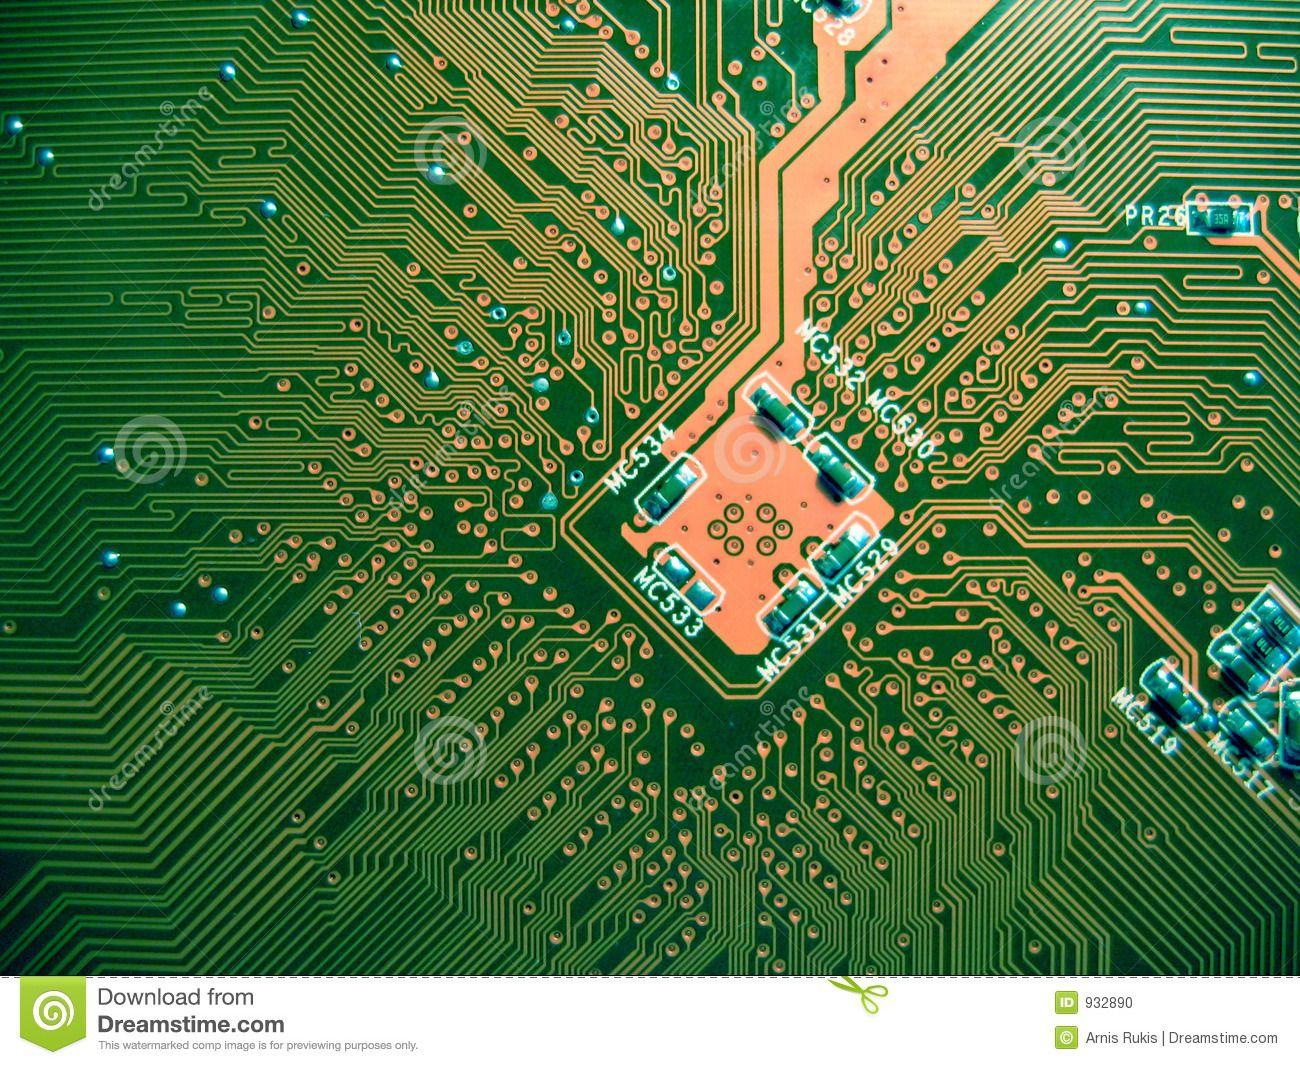 Printed Circuit Board 932890 Jpg 1300 1065 Printed Circuit Board Circuit Board Tech Art